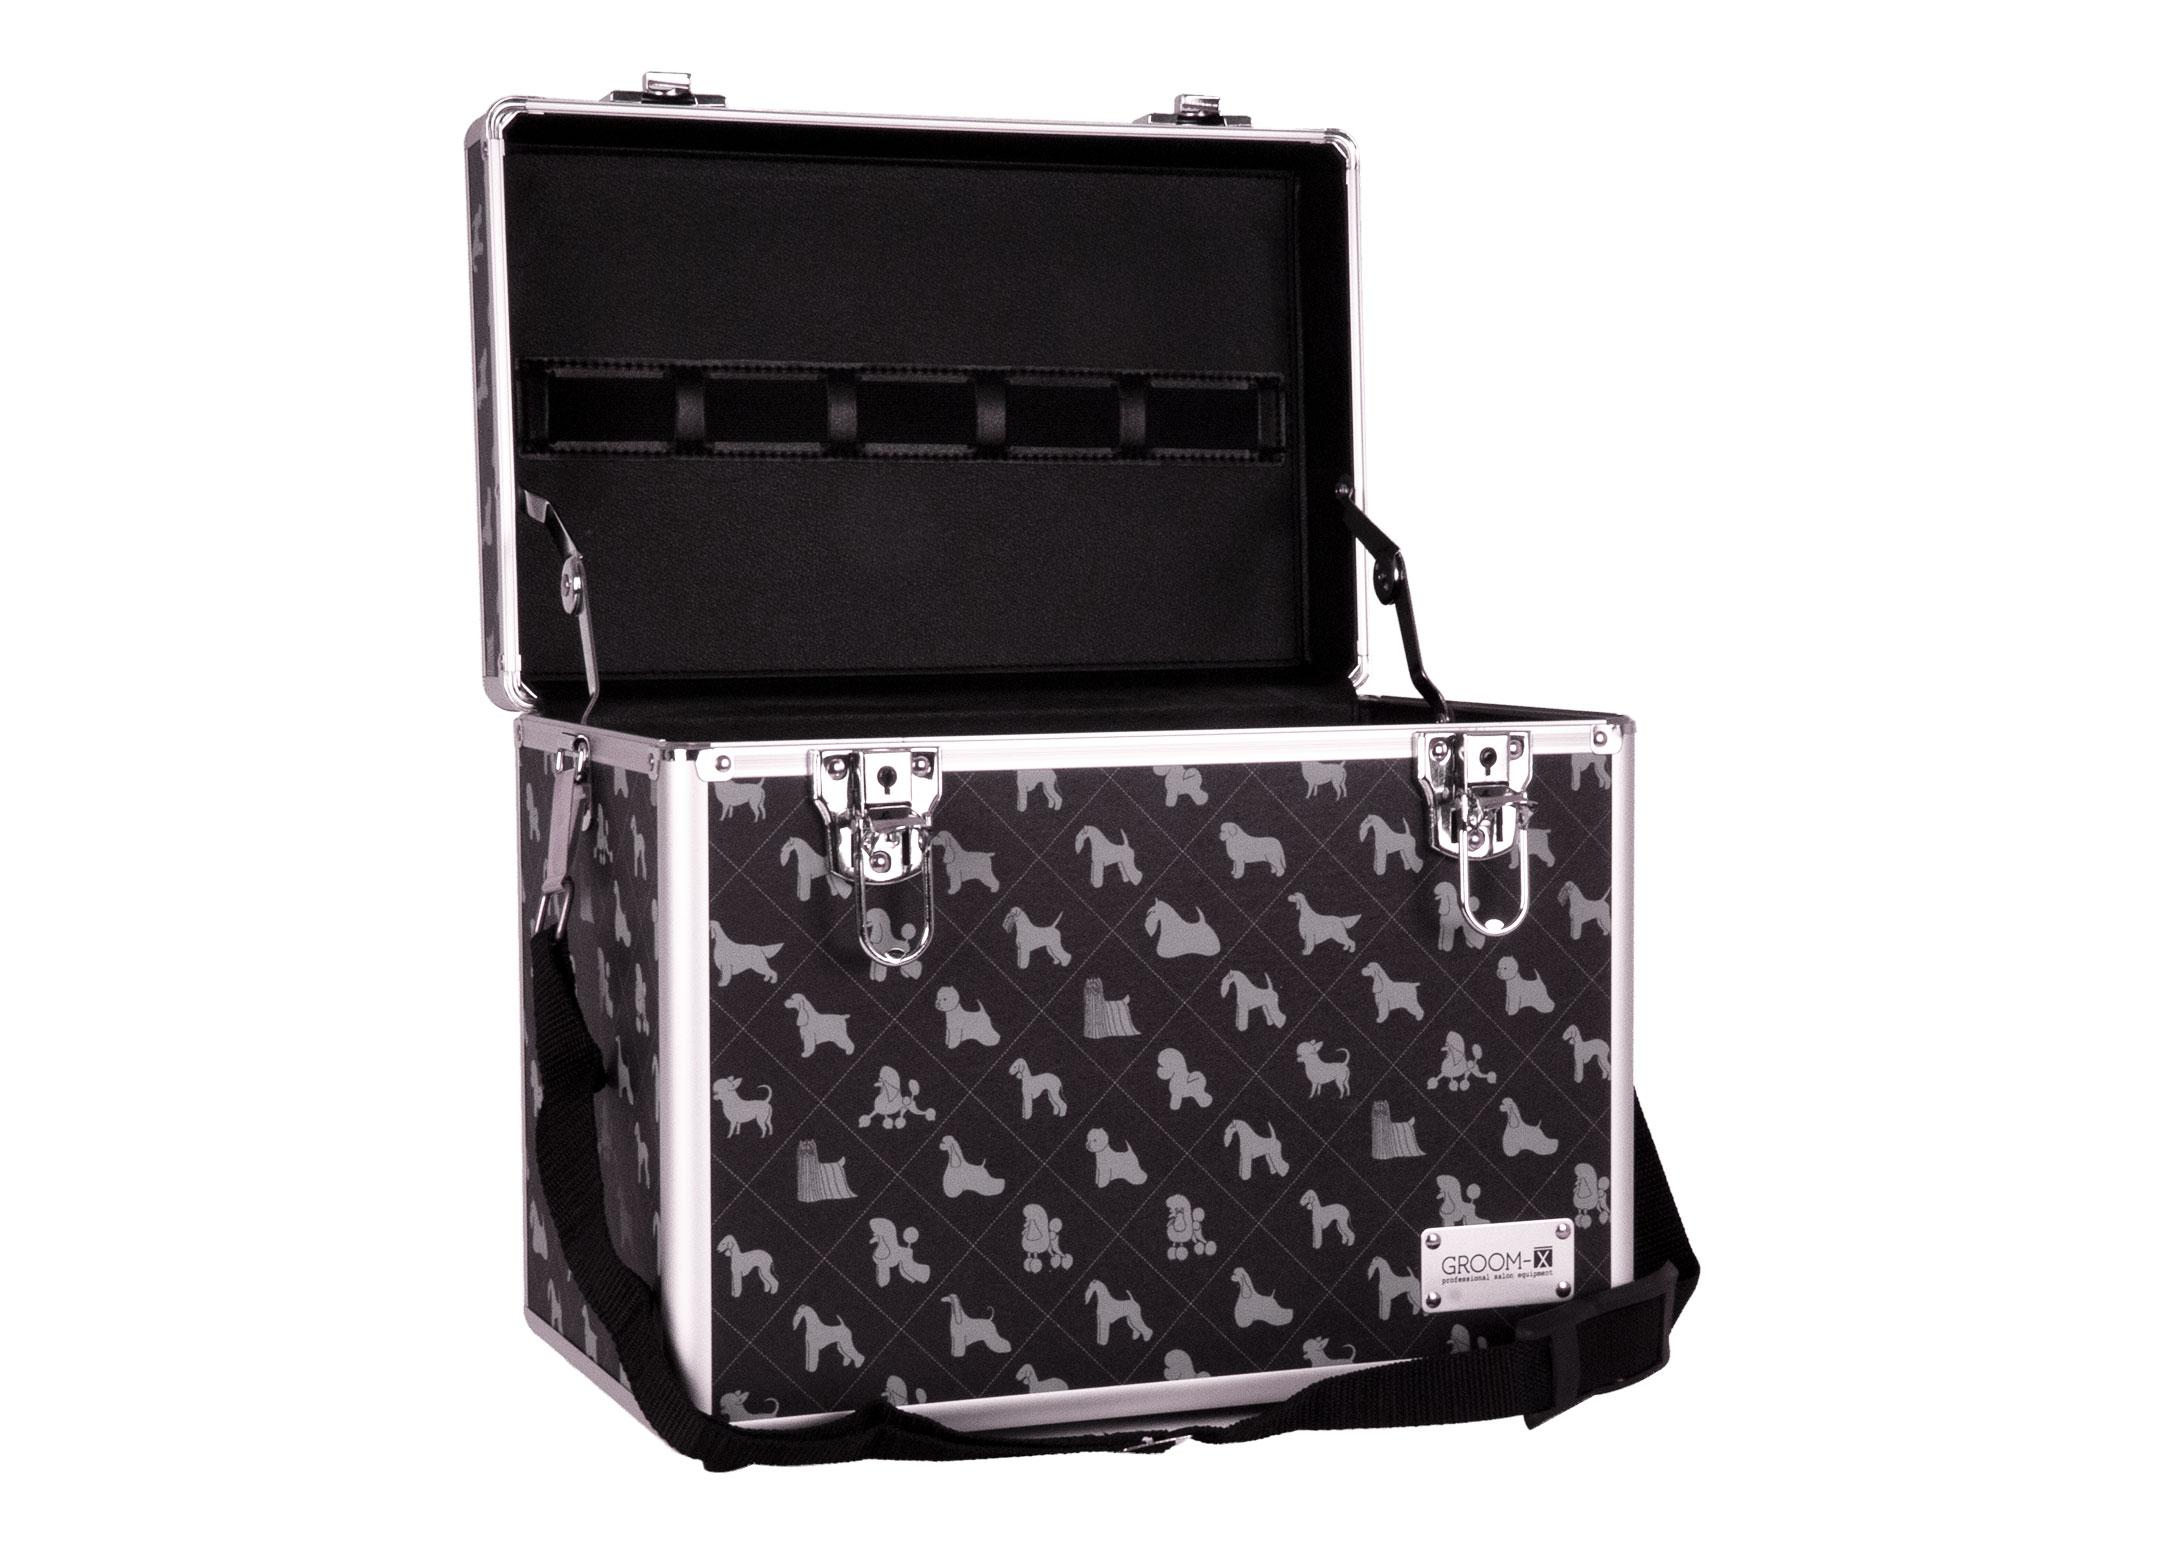 Groom-X Grooming Case Portable K-Design